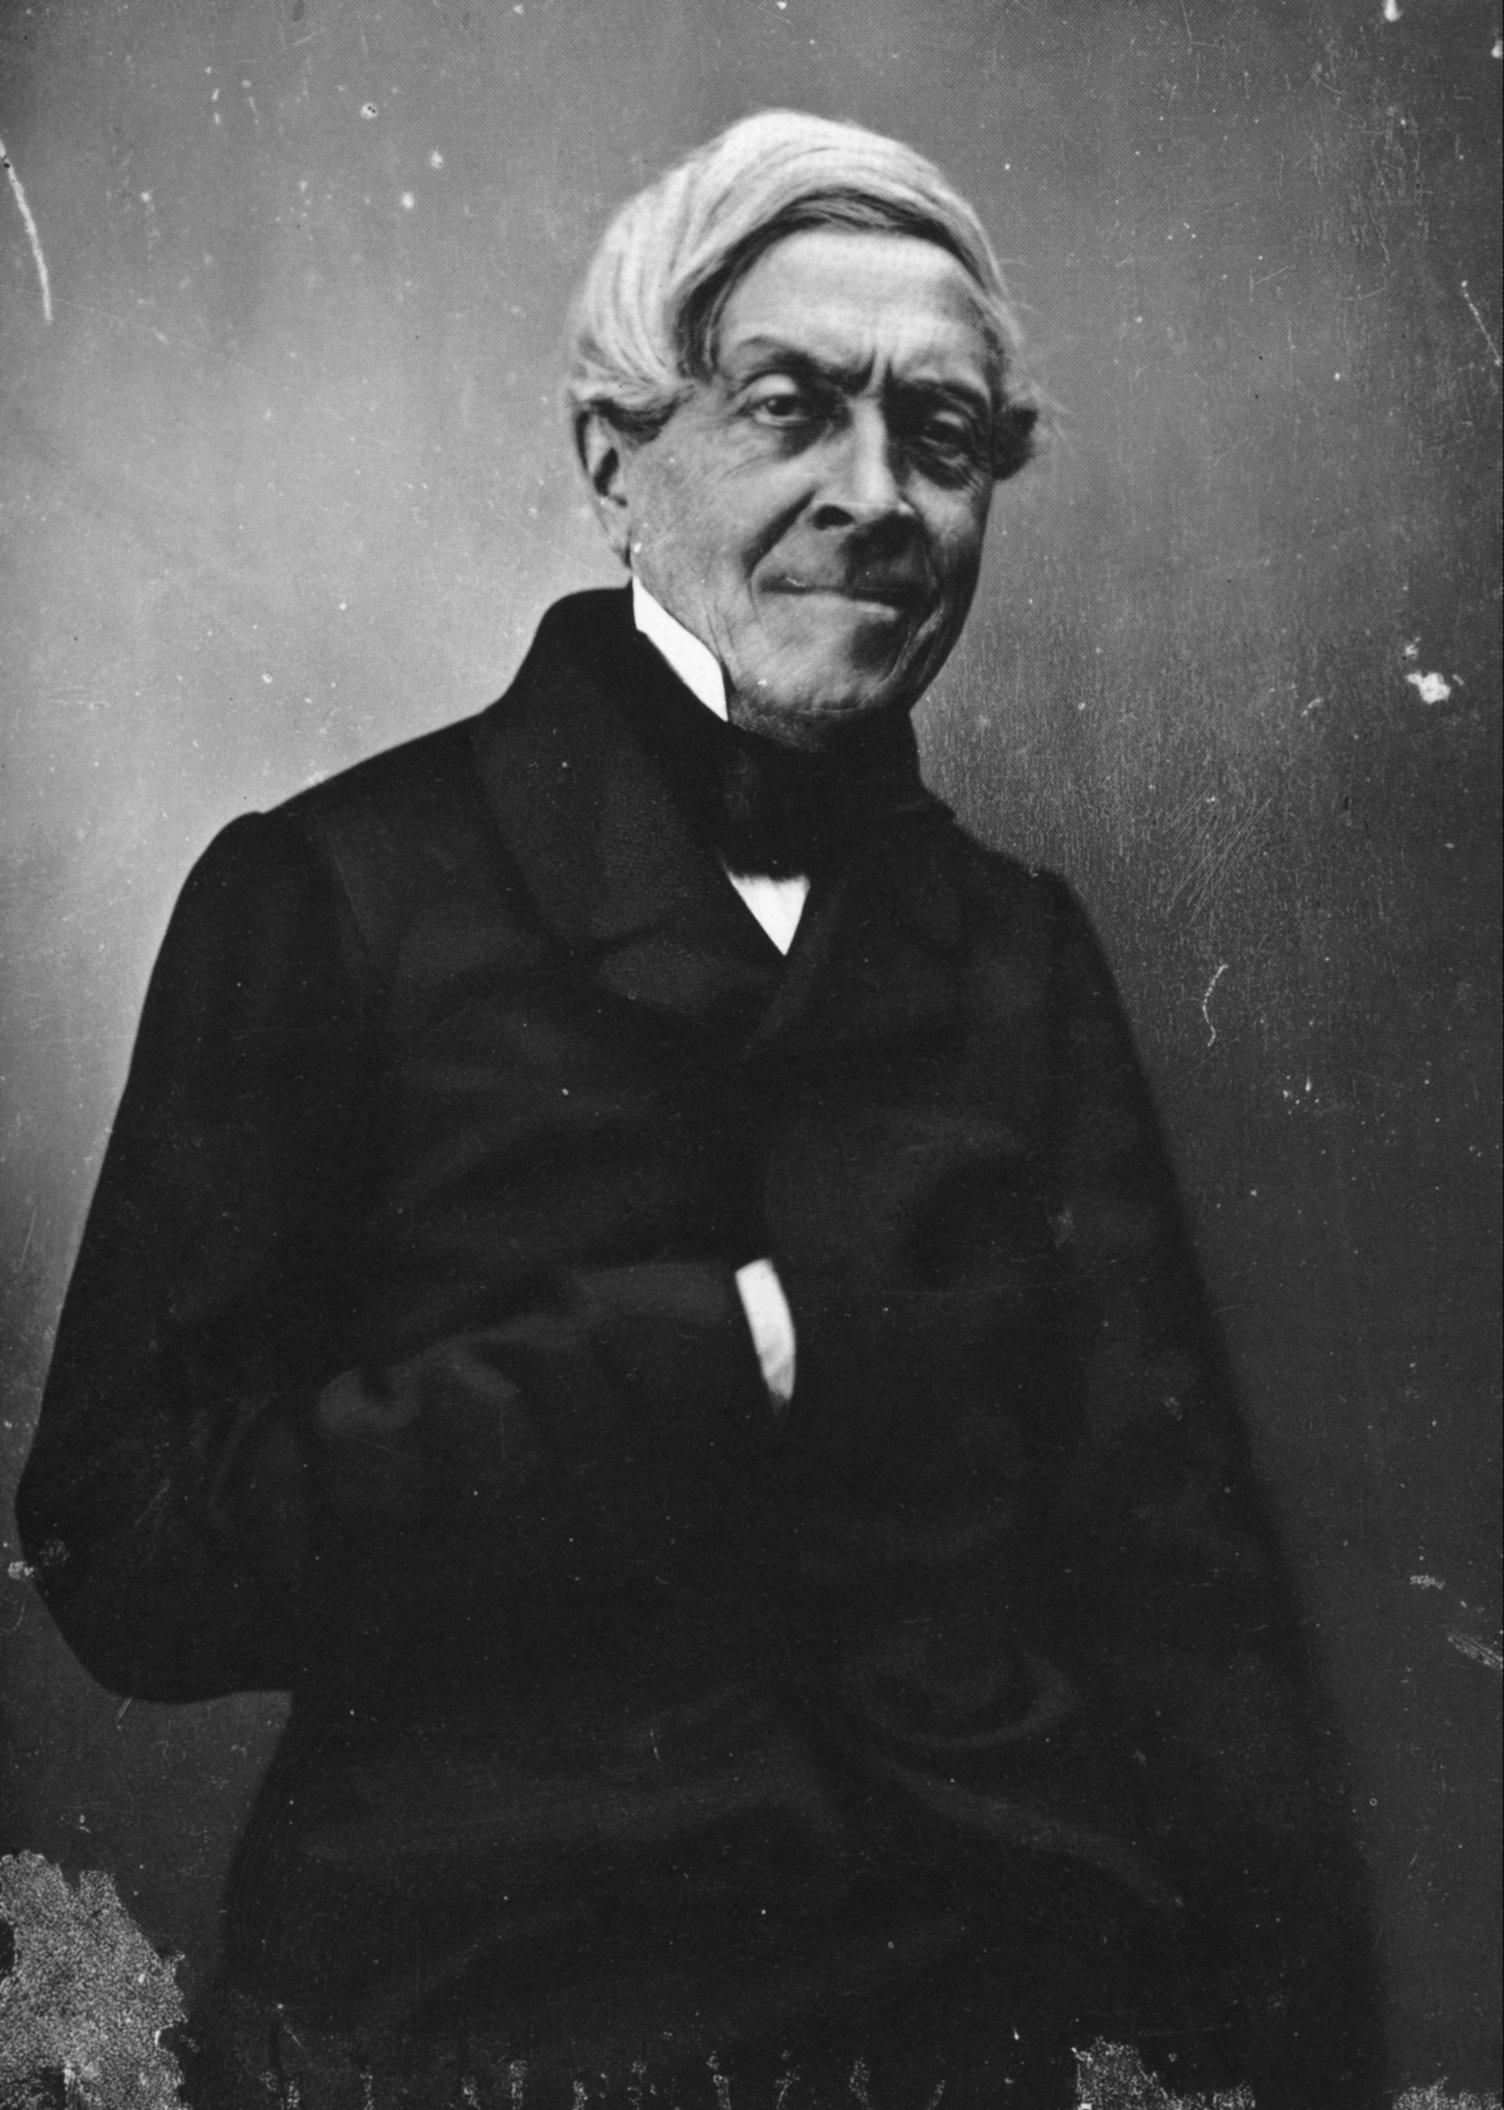 Félix_Nadar_1820-1910_portraits_Jules_Michelet.jpg